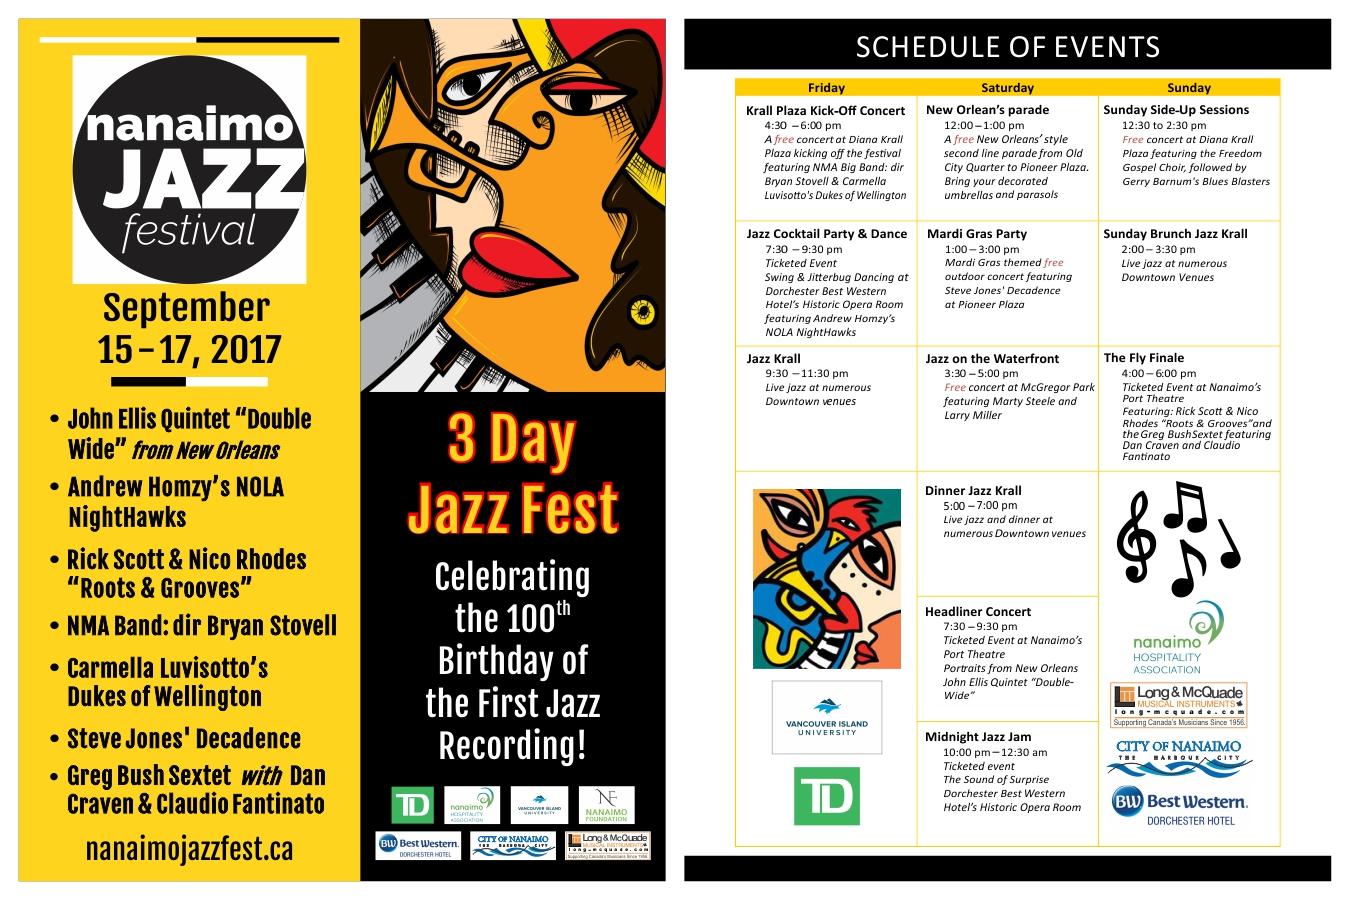 Nanimo_Jazz_Festival_Poster_2017AugB.jpg